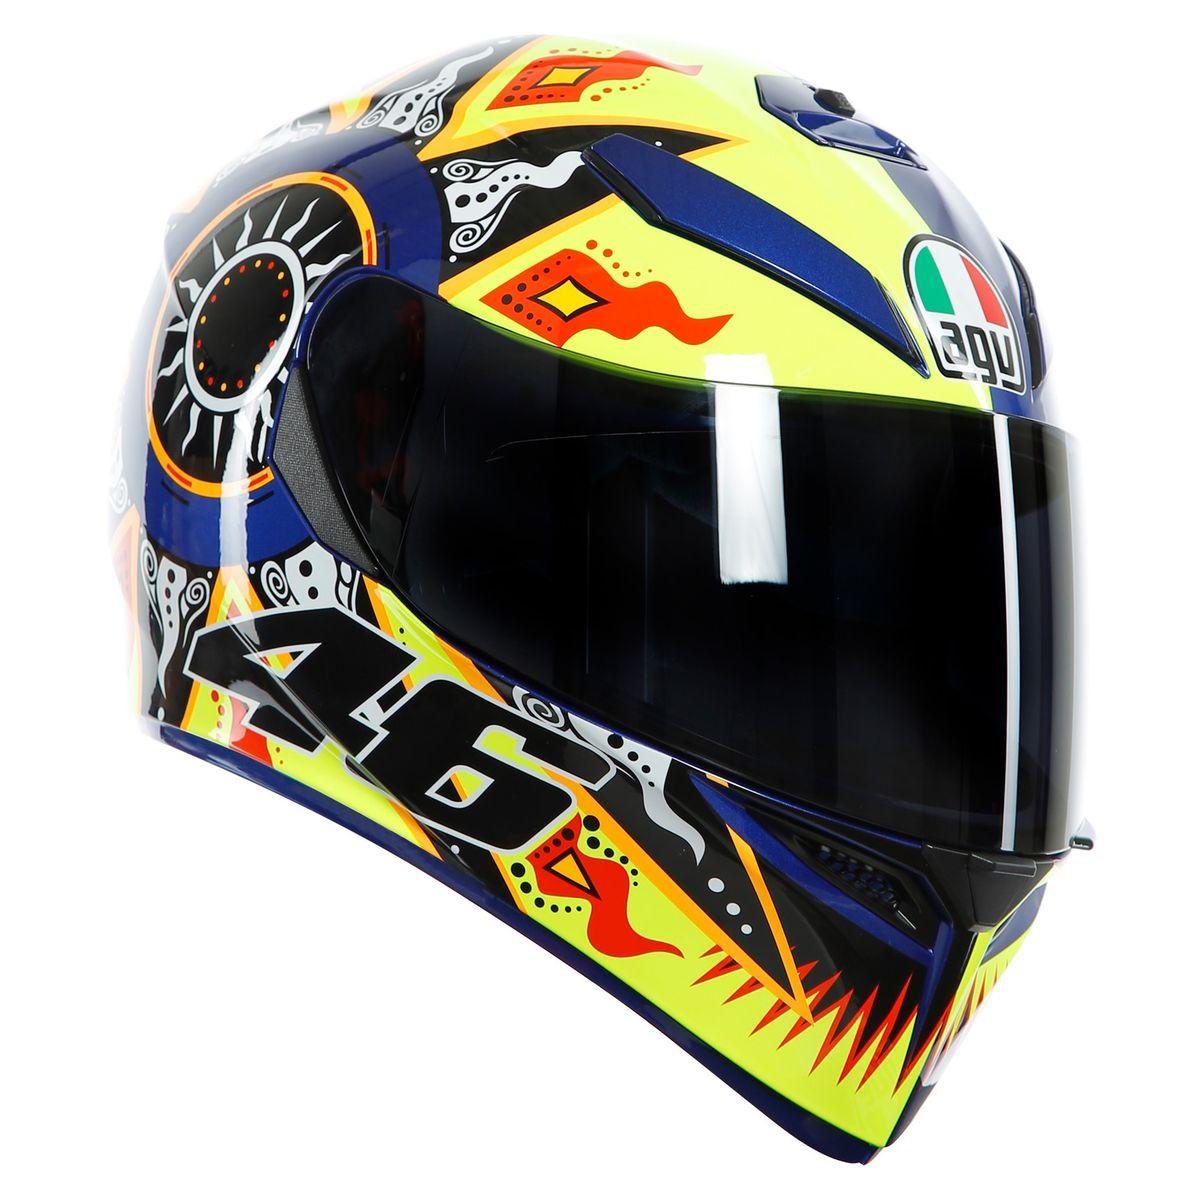 Casco Moto integral AGV K3 SV Rossi 2002 - Adrian Store